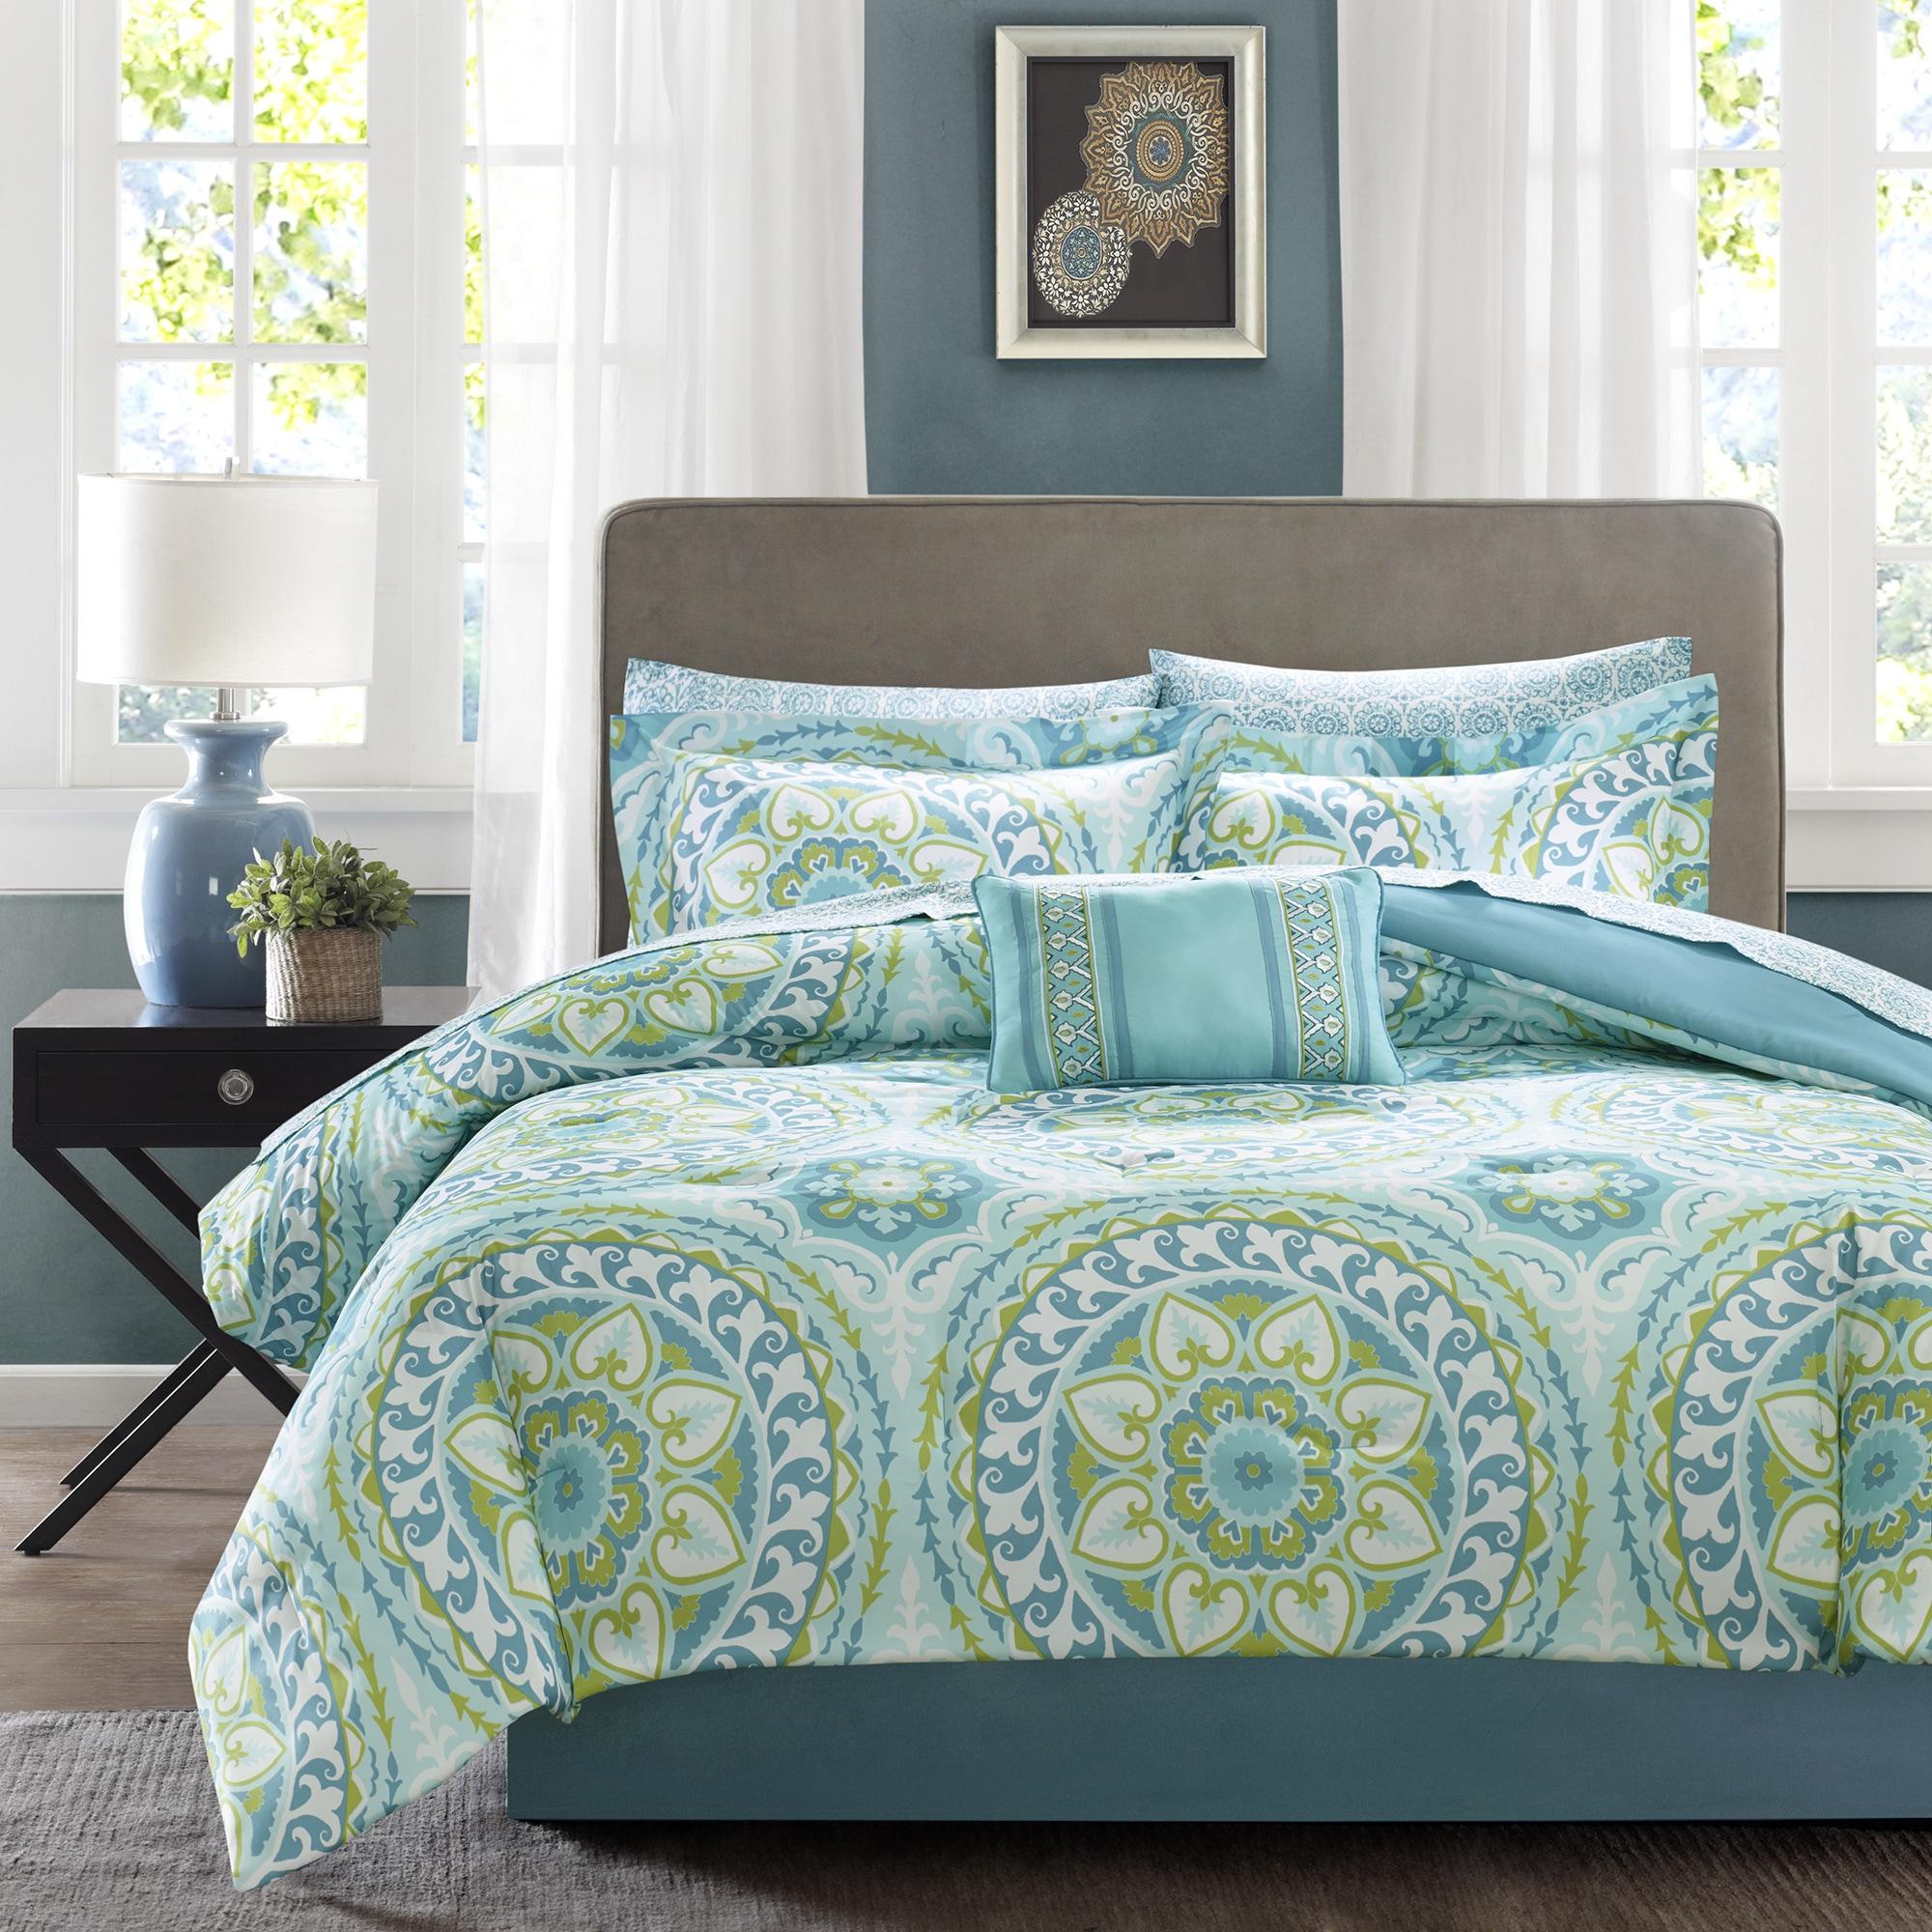 butterfly comforter overstock ip bed printed walmart cotton lullaby set piece bedding com garden